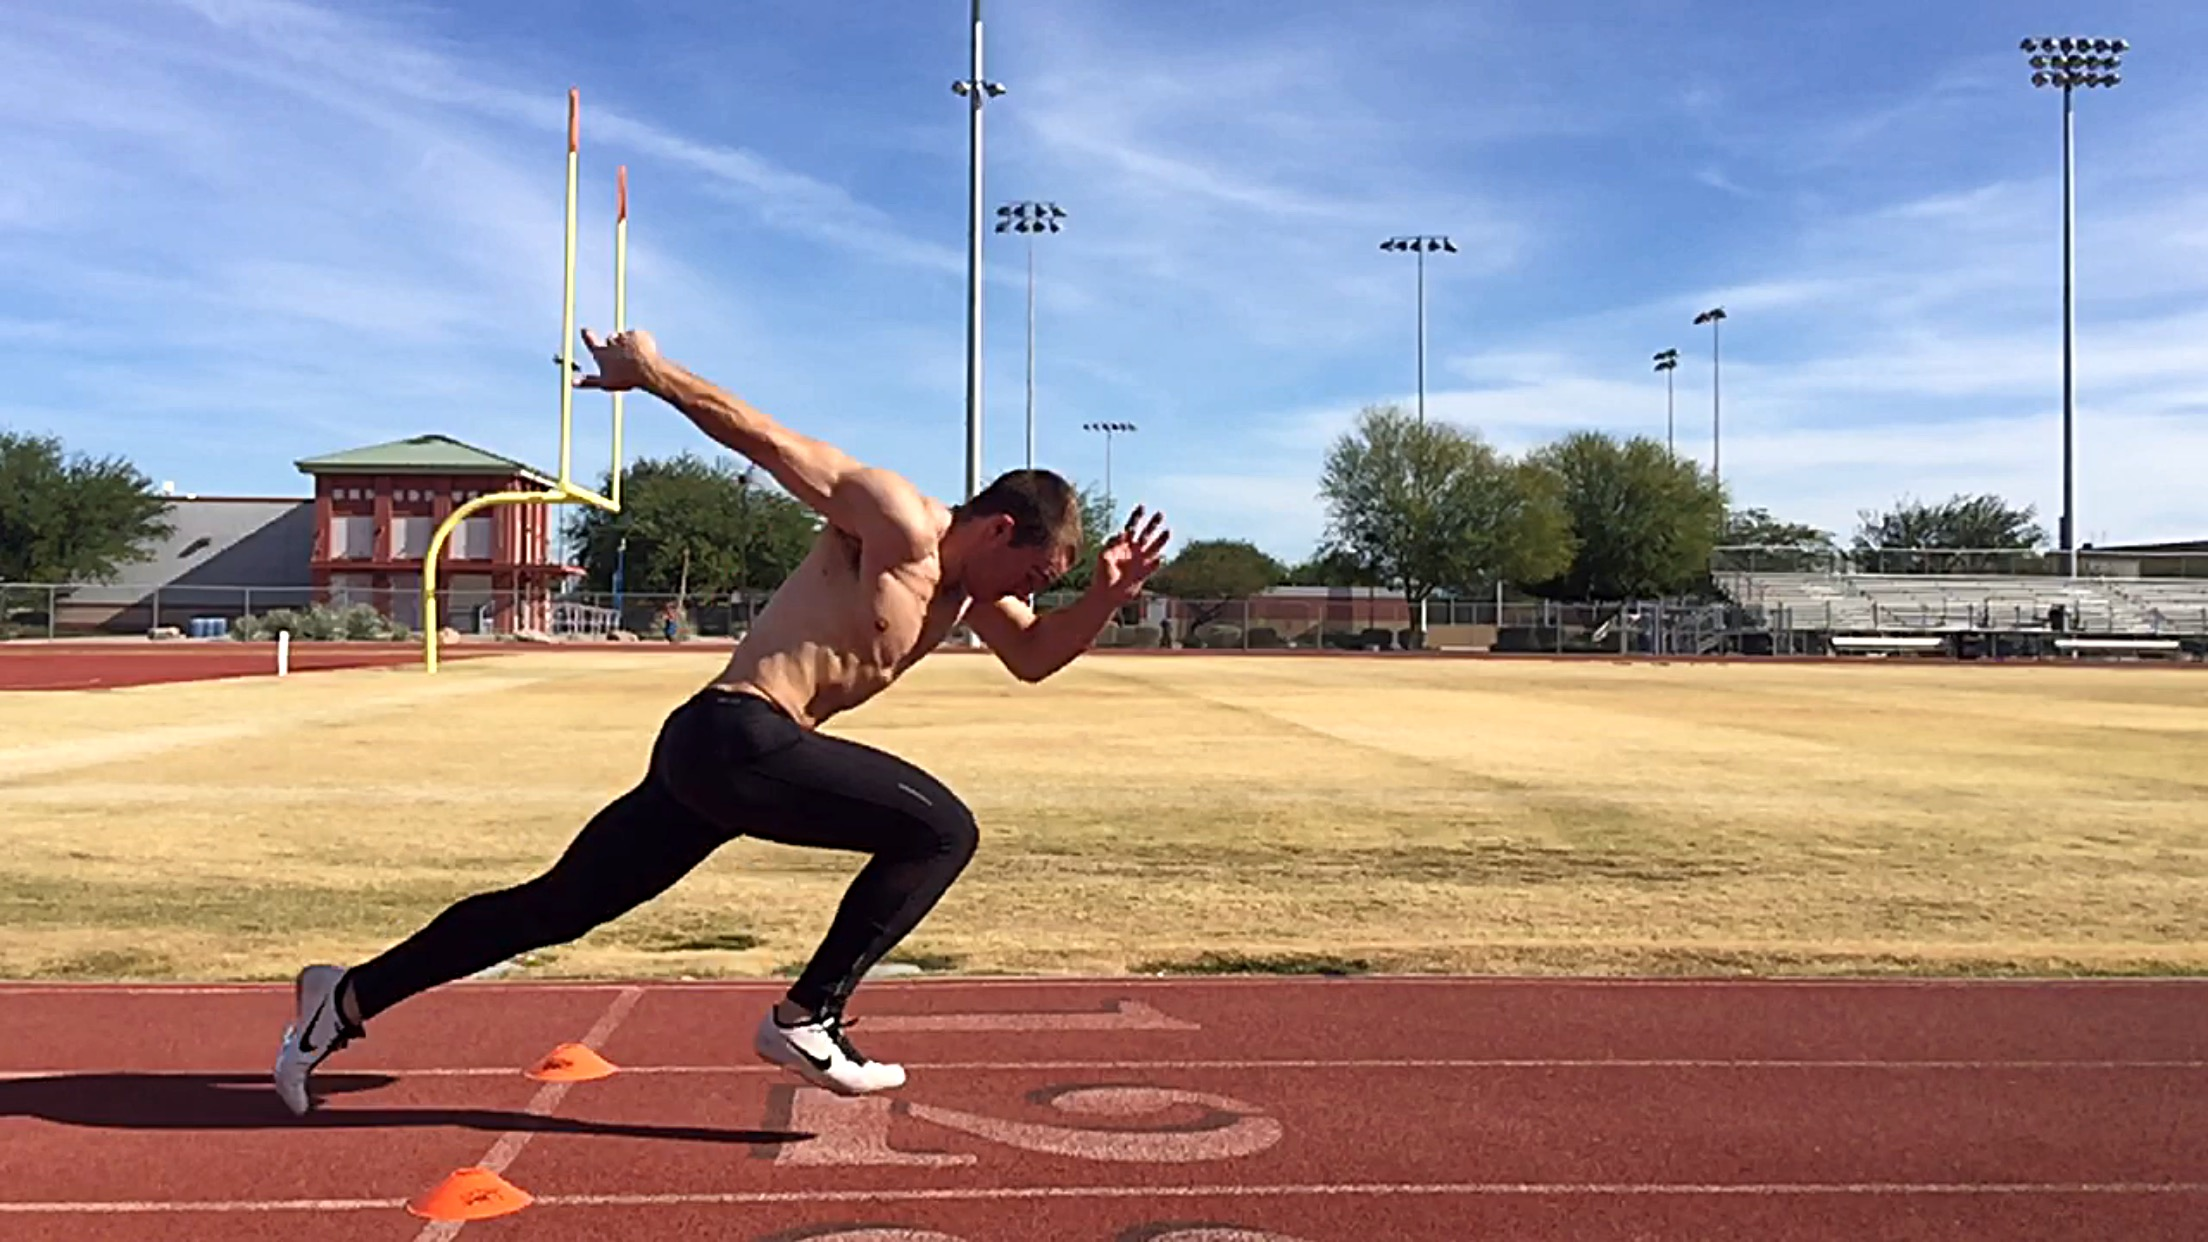 image for acceleration training sprint training